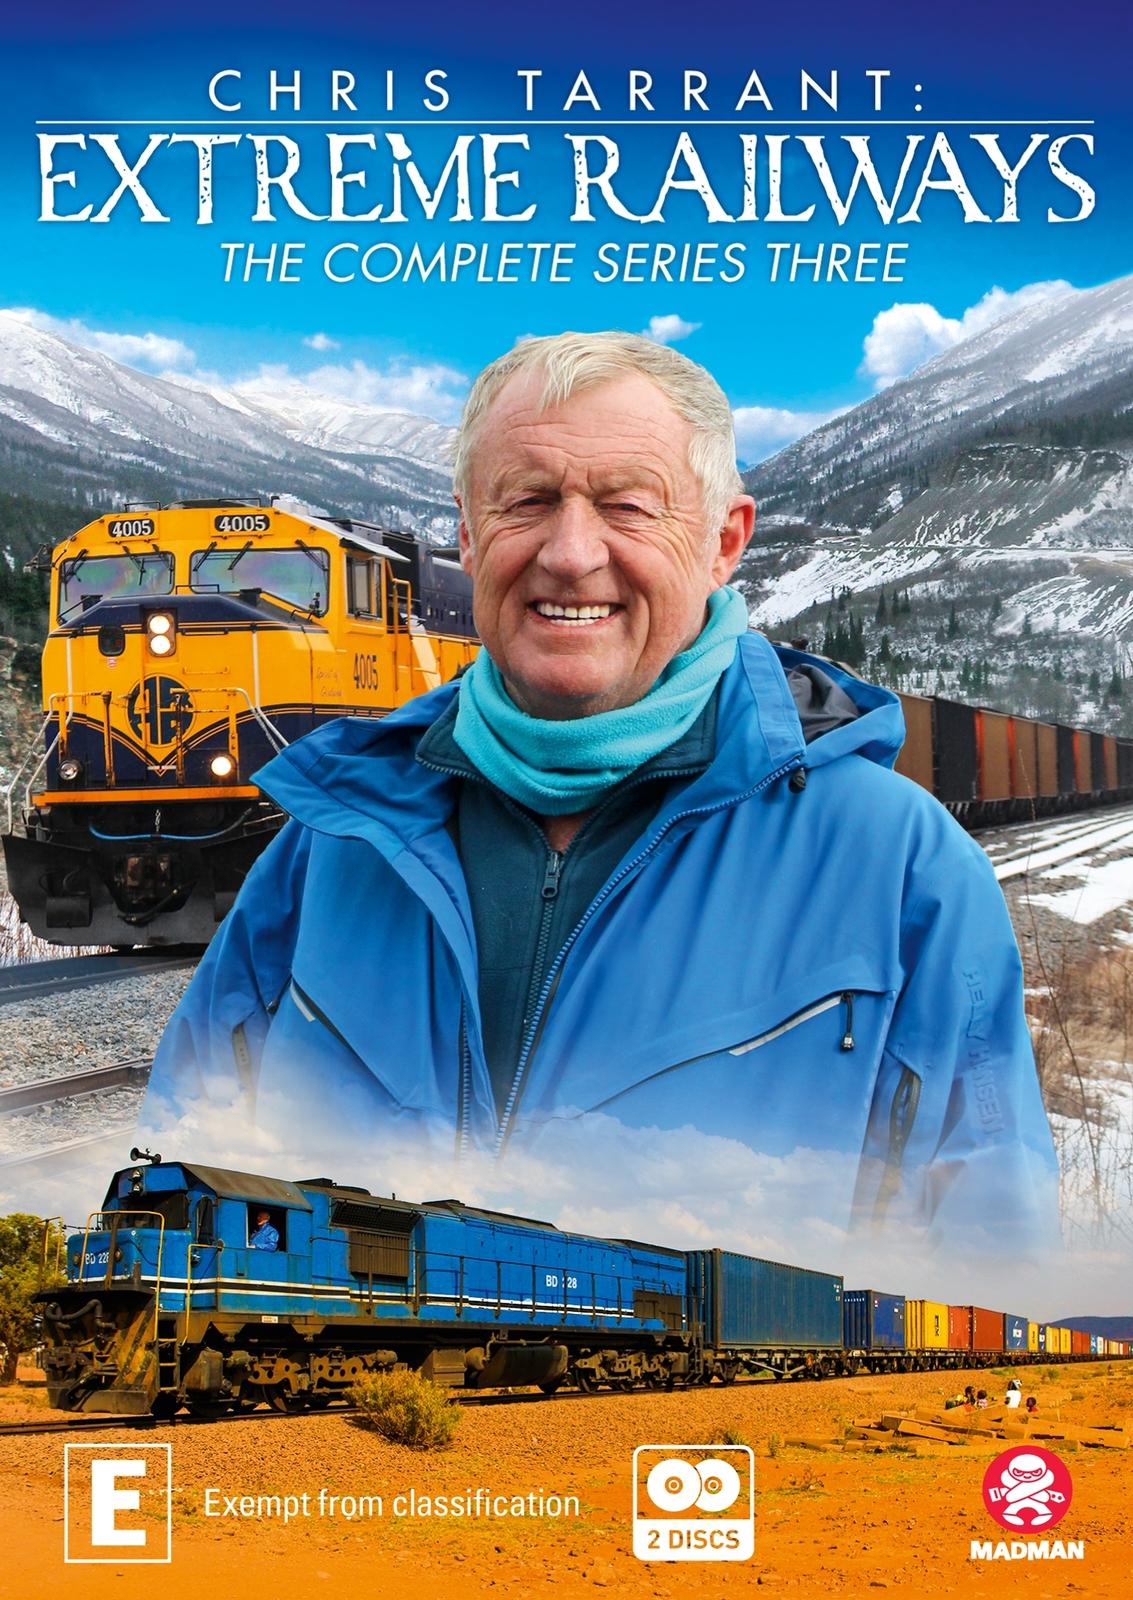 Chris Tarrant's Extreme Railways: Series 3 on DVD image